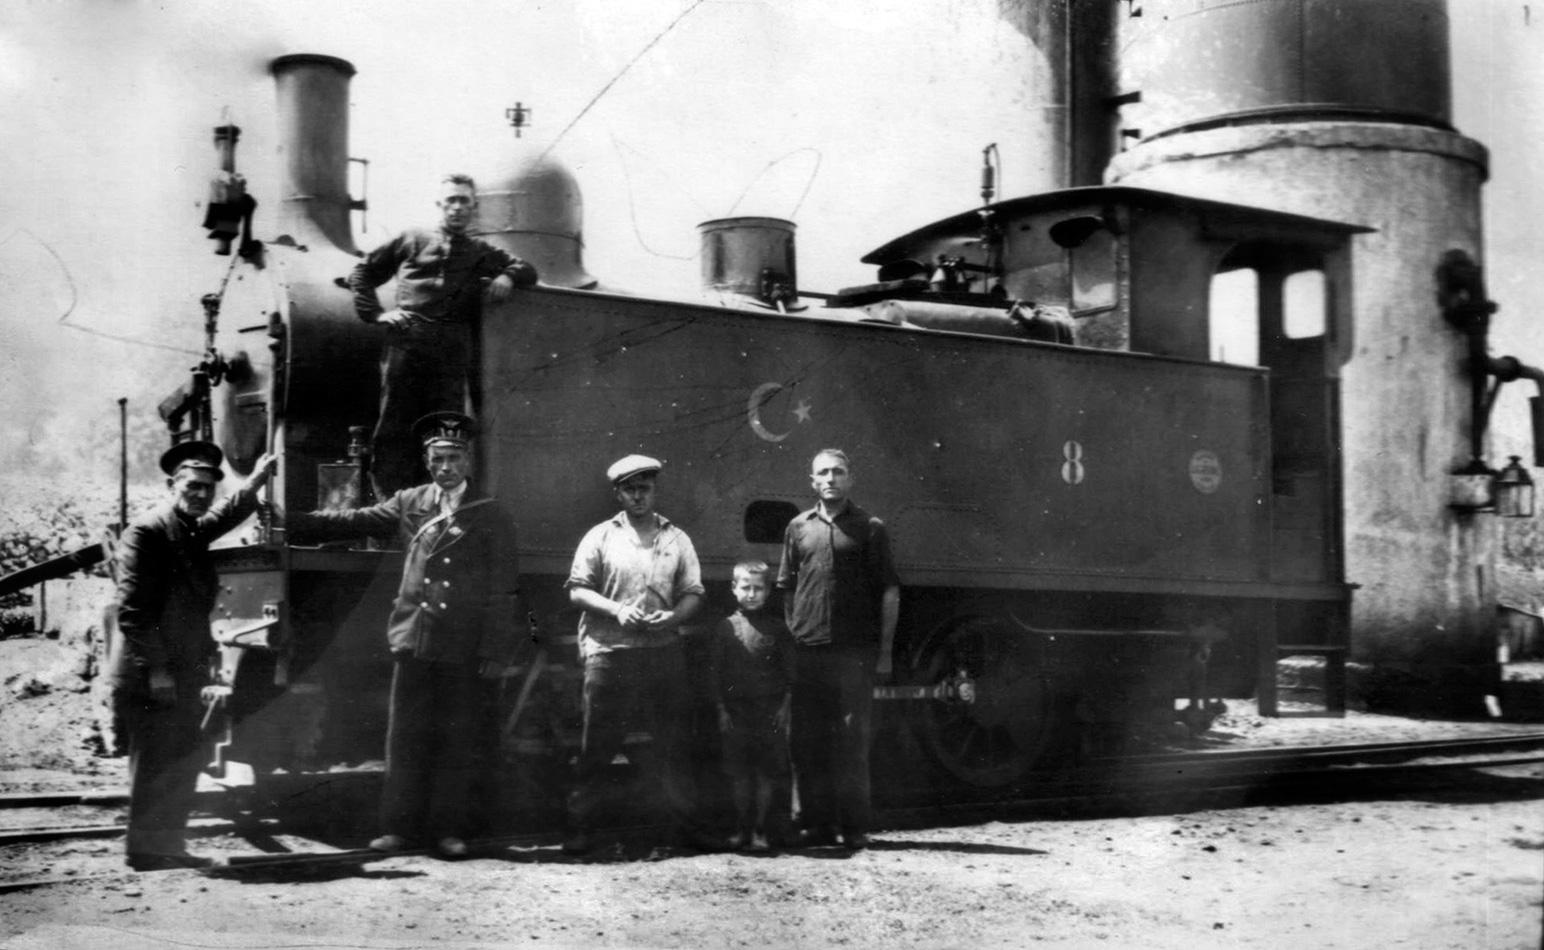 Бурса Муданя влак парен локомотив